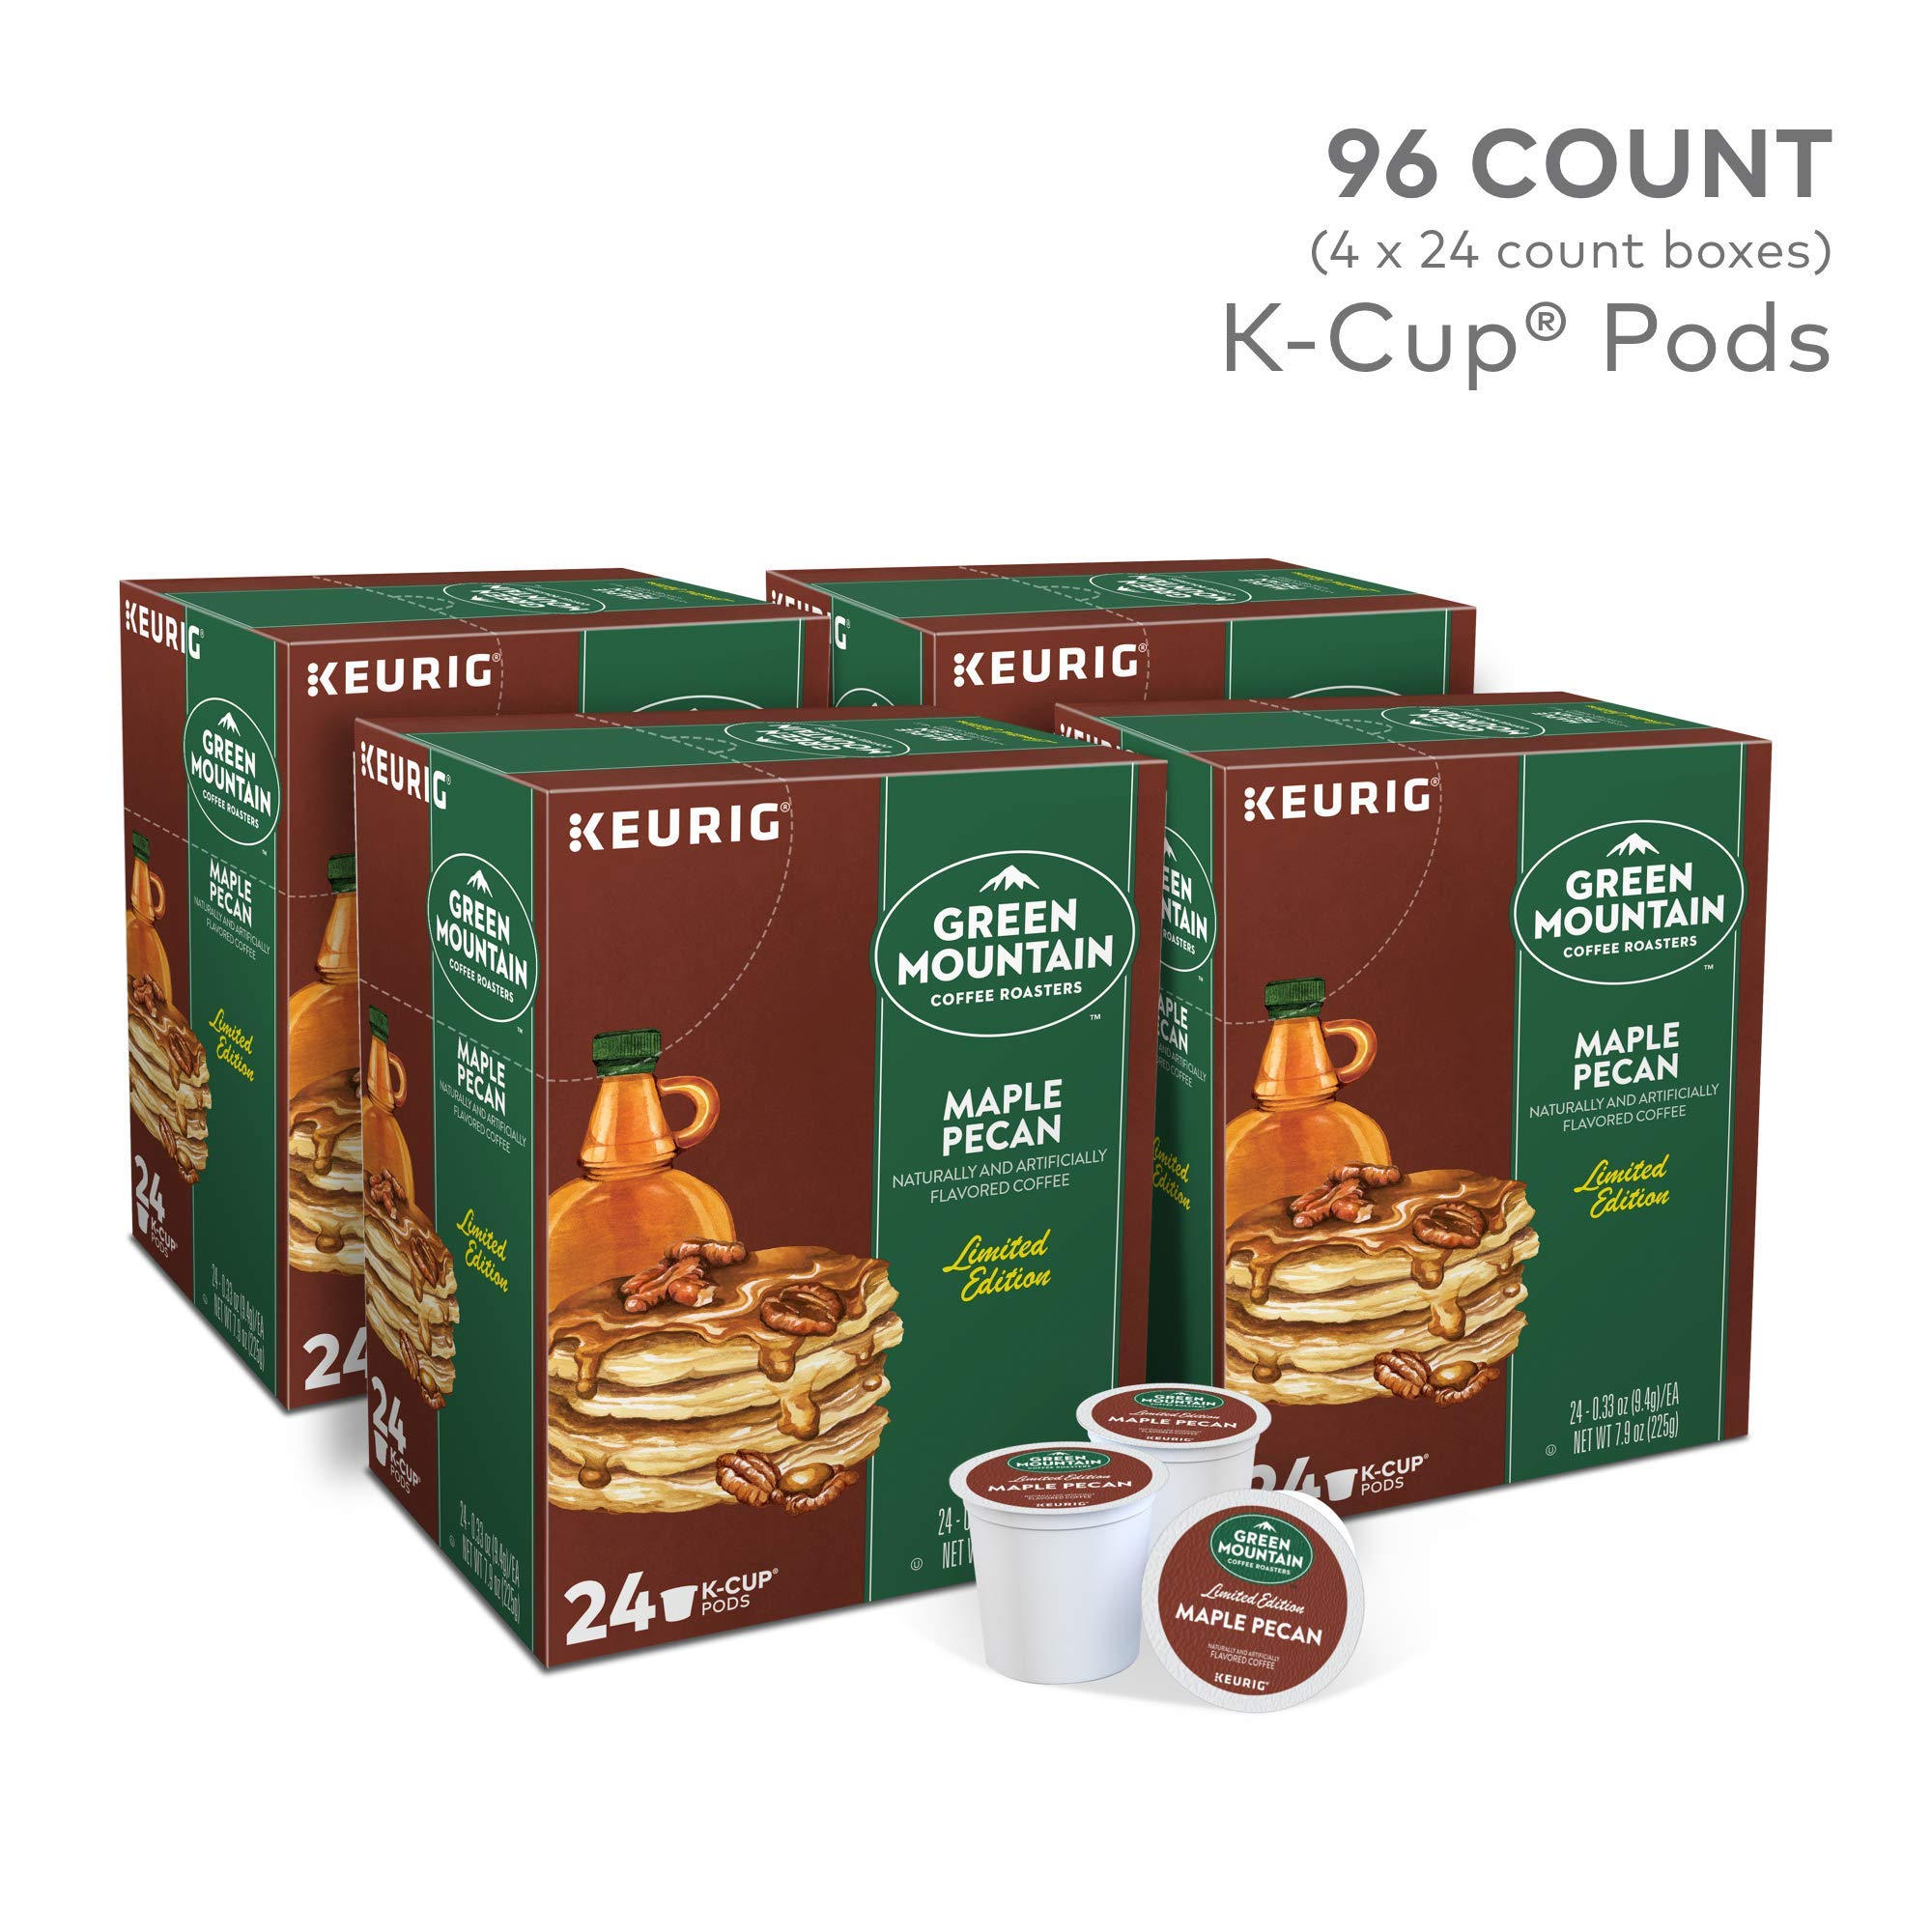 Green Mountain Coffee Roasters  Maple Pecan, 96 Count by Green Mountain Coffee Roasters (Image #2)